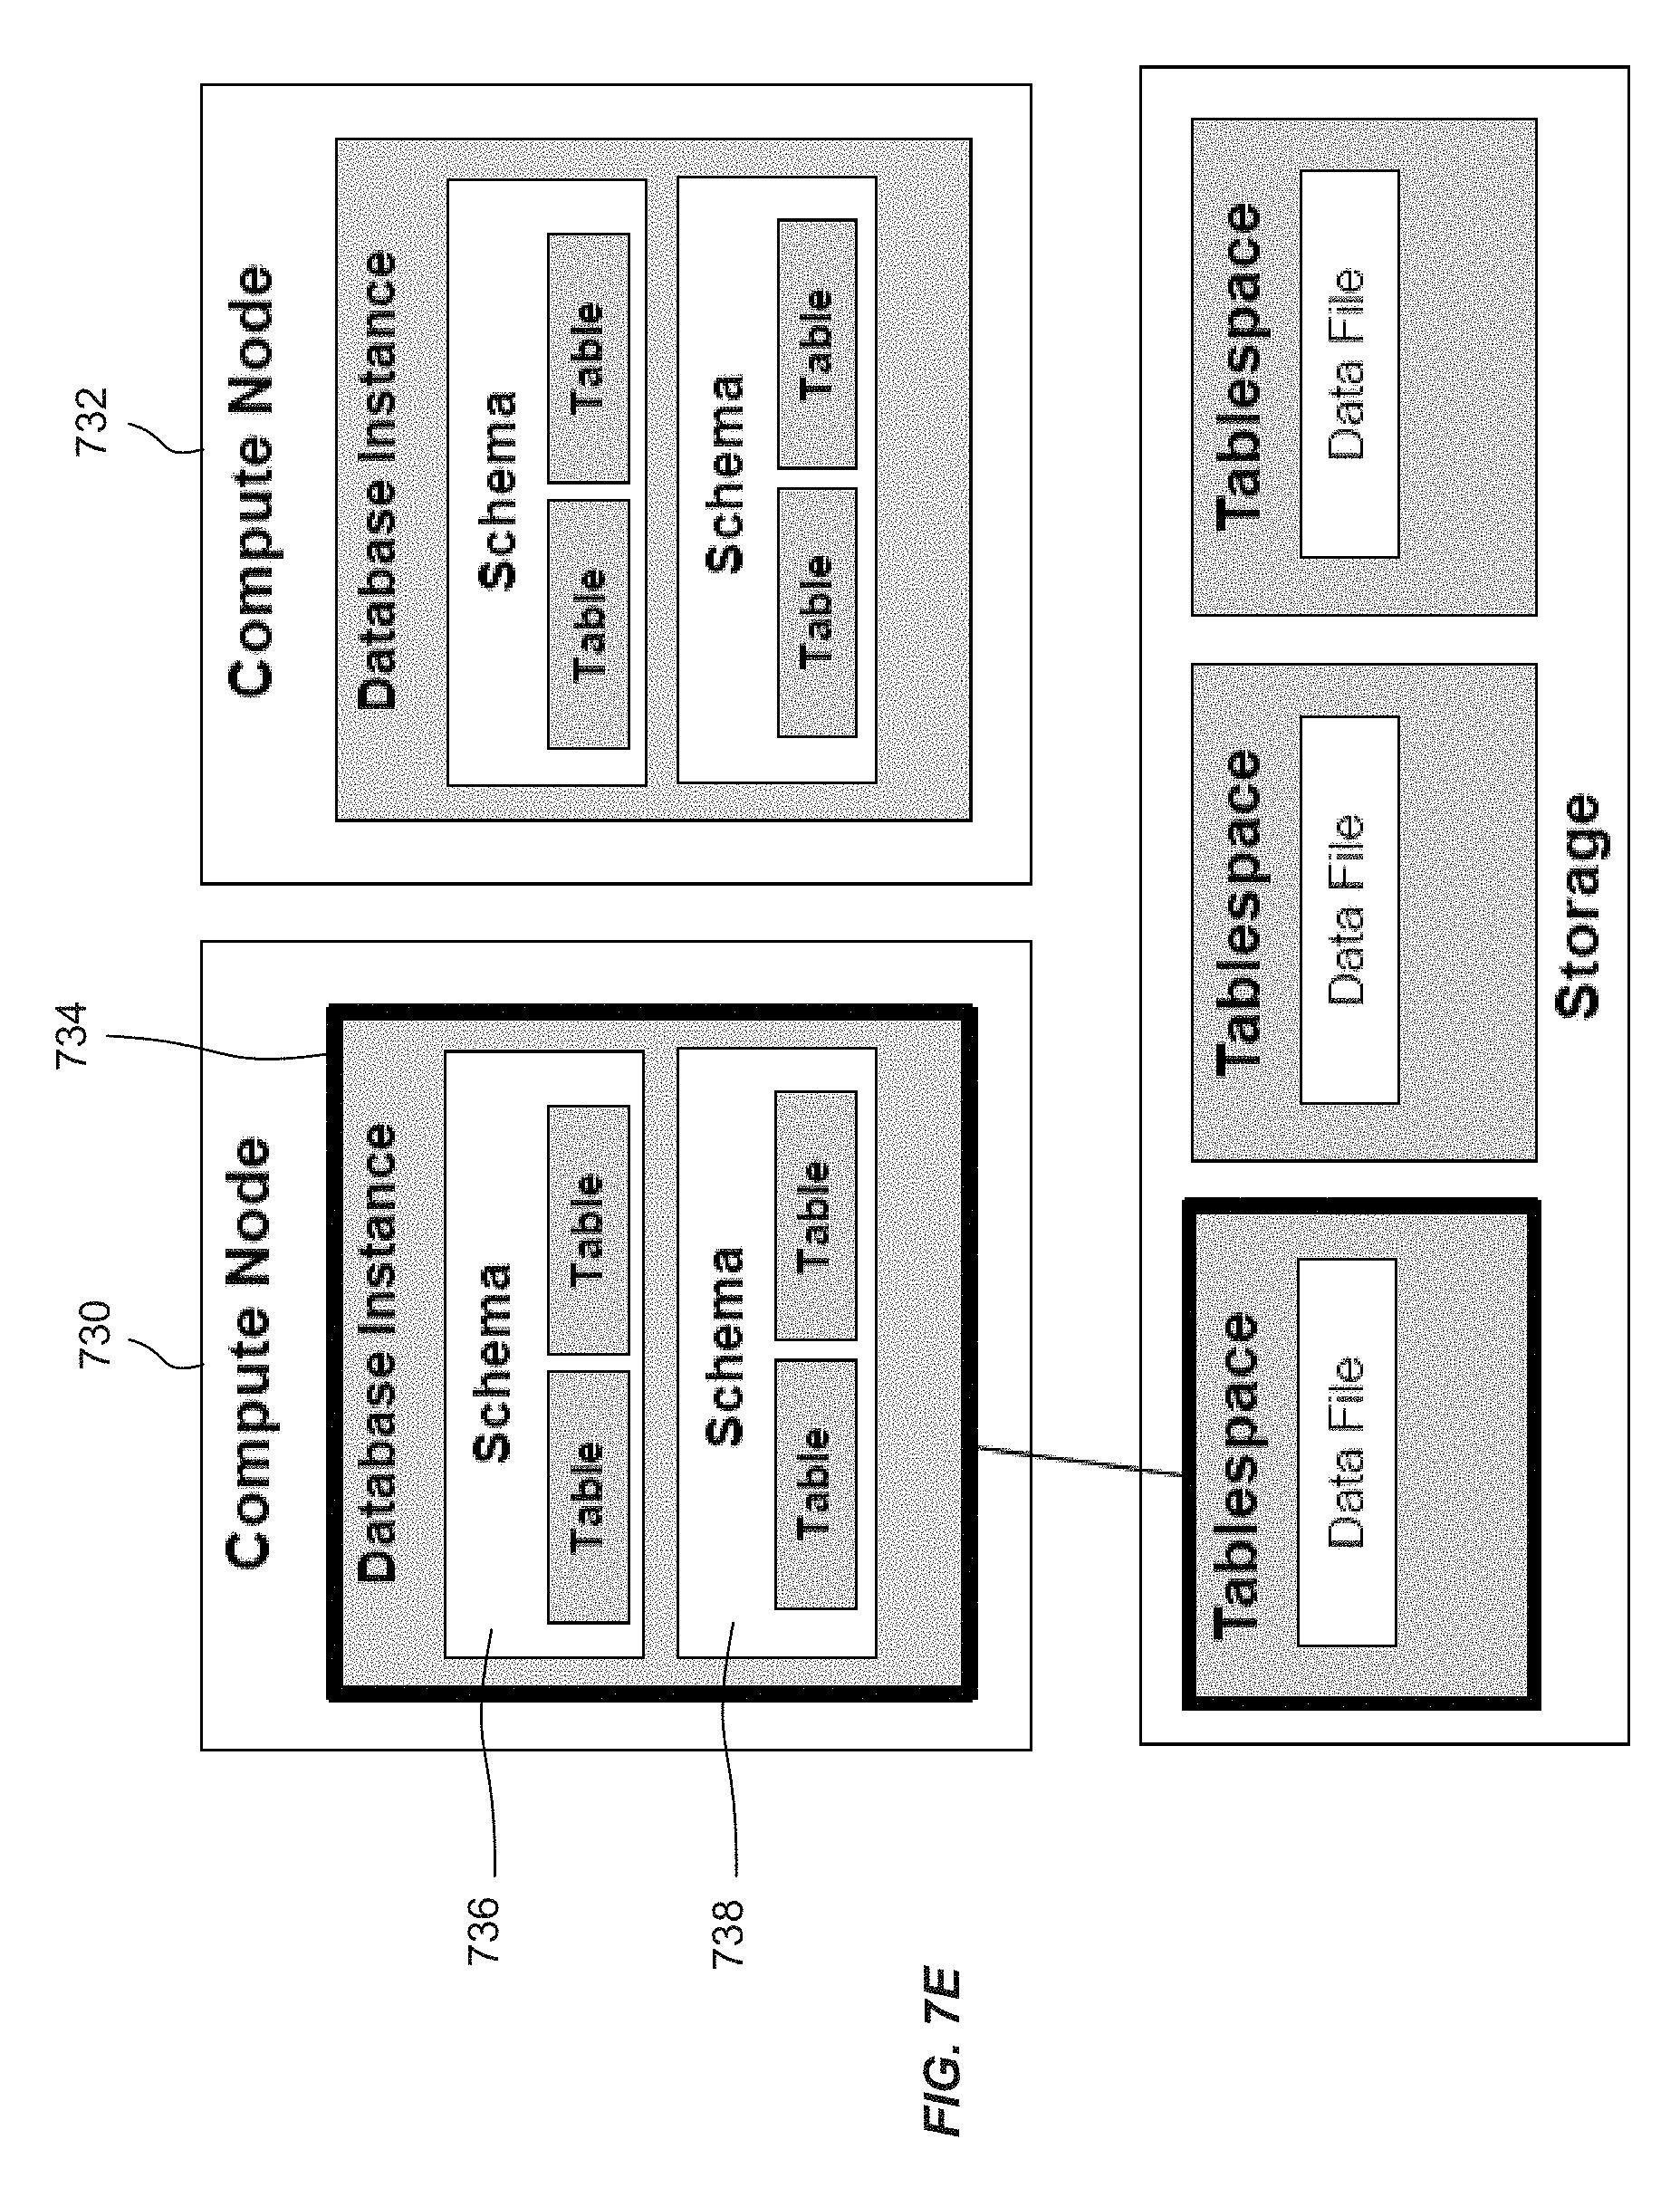 Patent US 9,792,338 B2